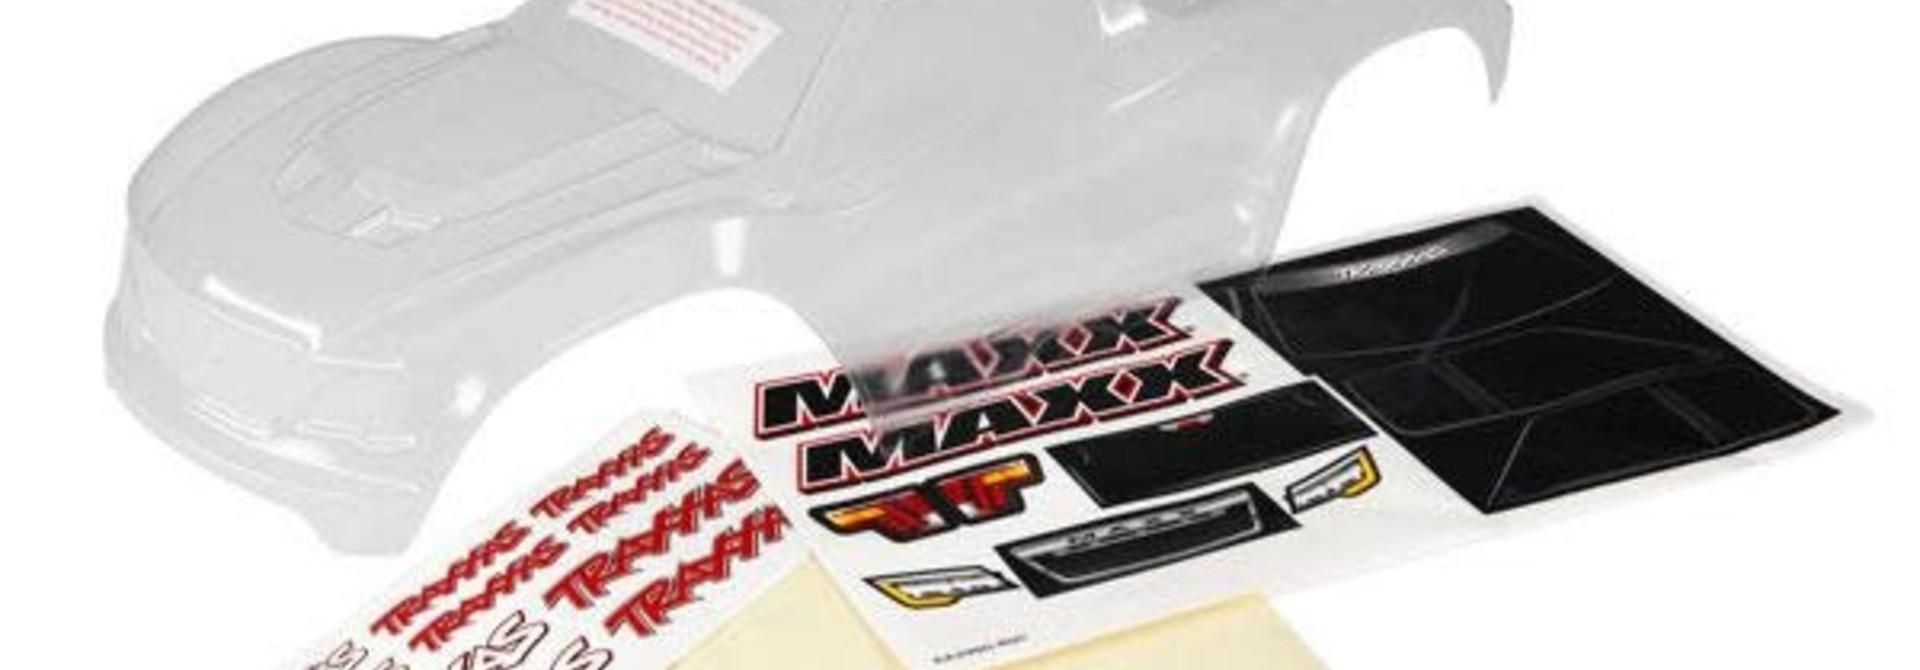 Body Maxx Clear Decals